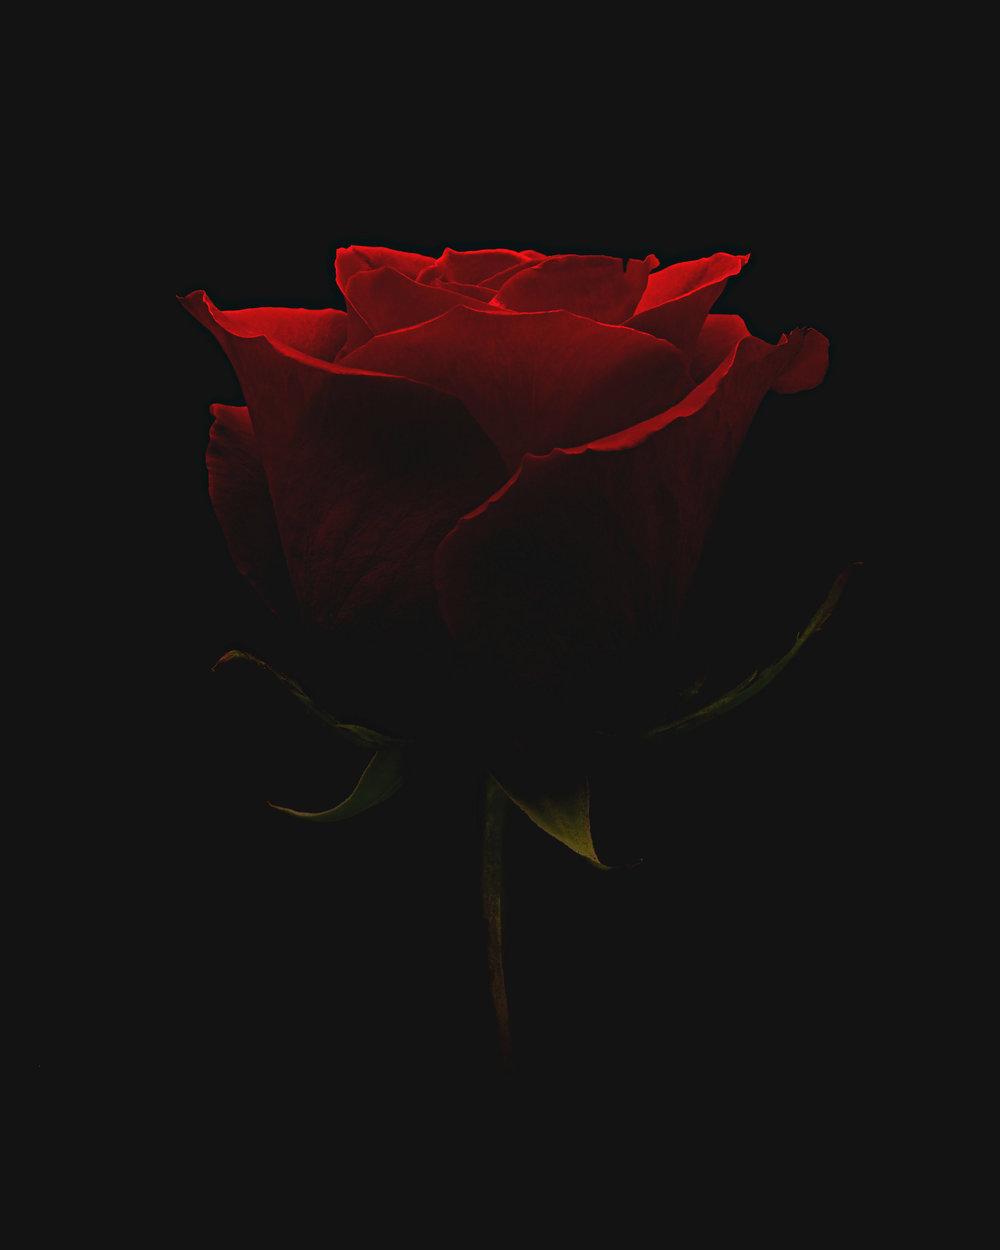 Rose-final copy.jpg